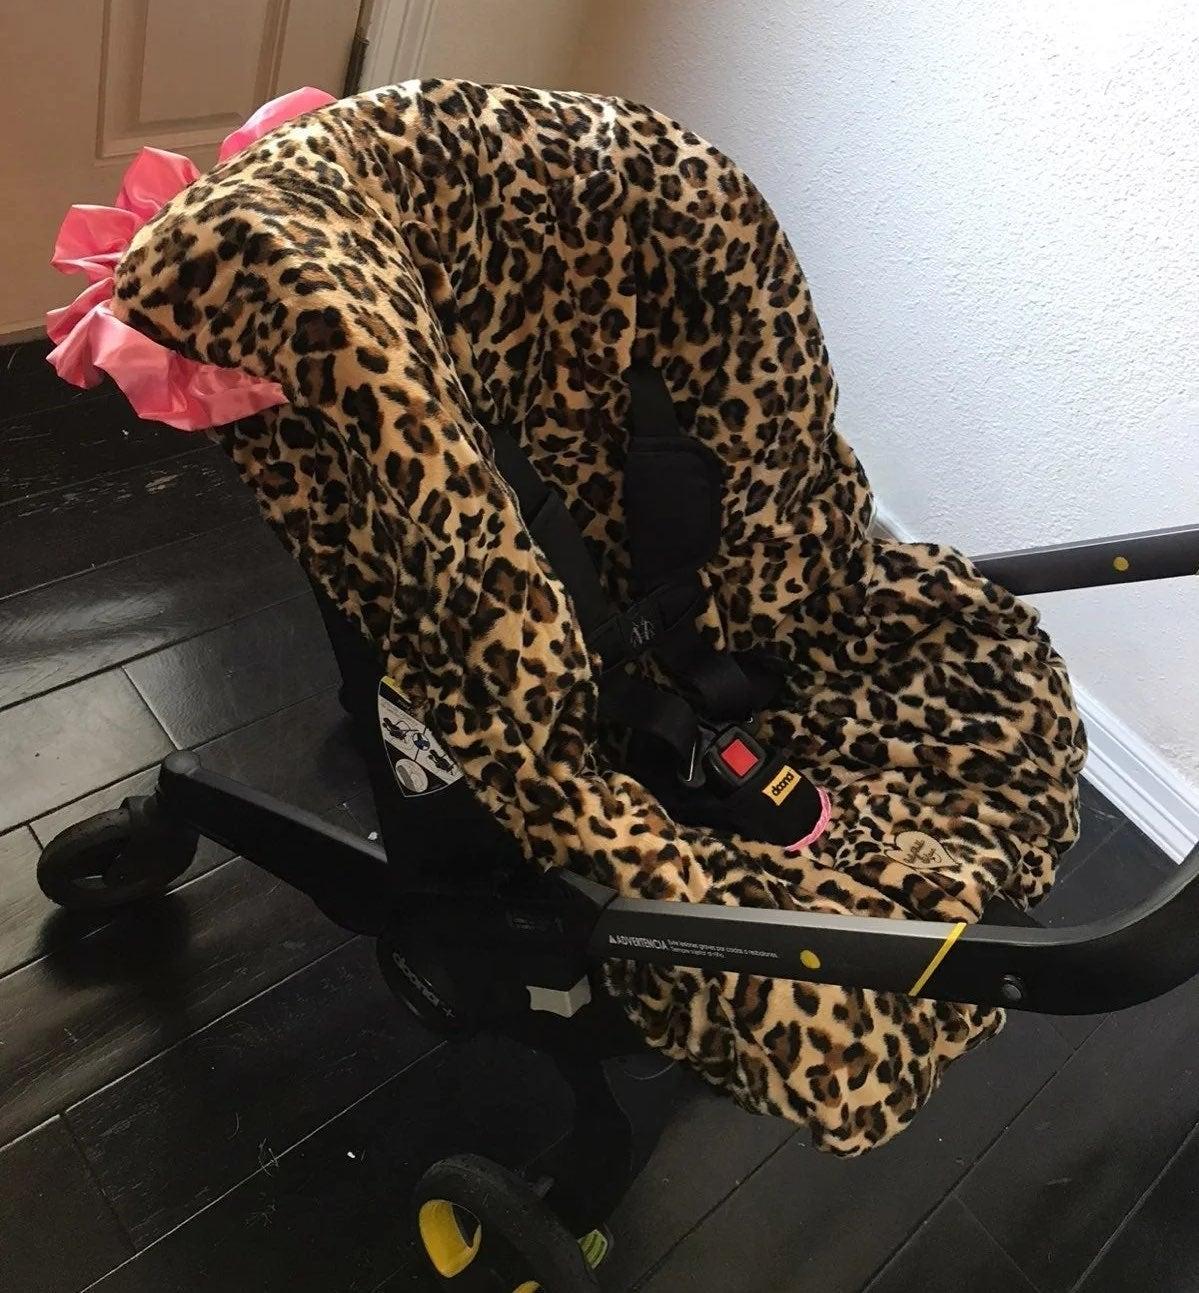 Baby Bella Leopard print Car Seat Cover